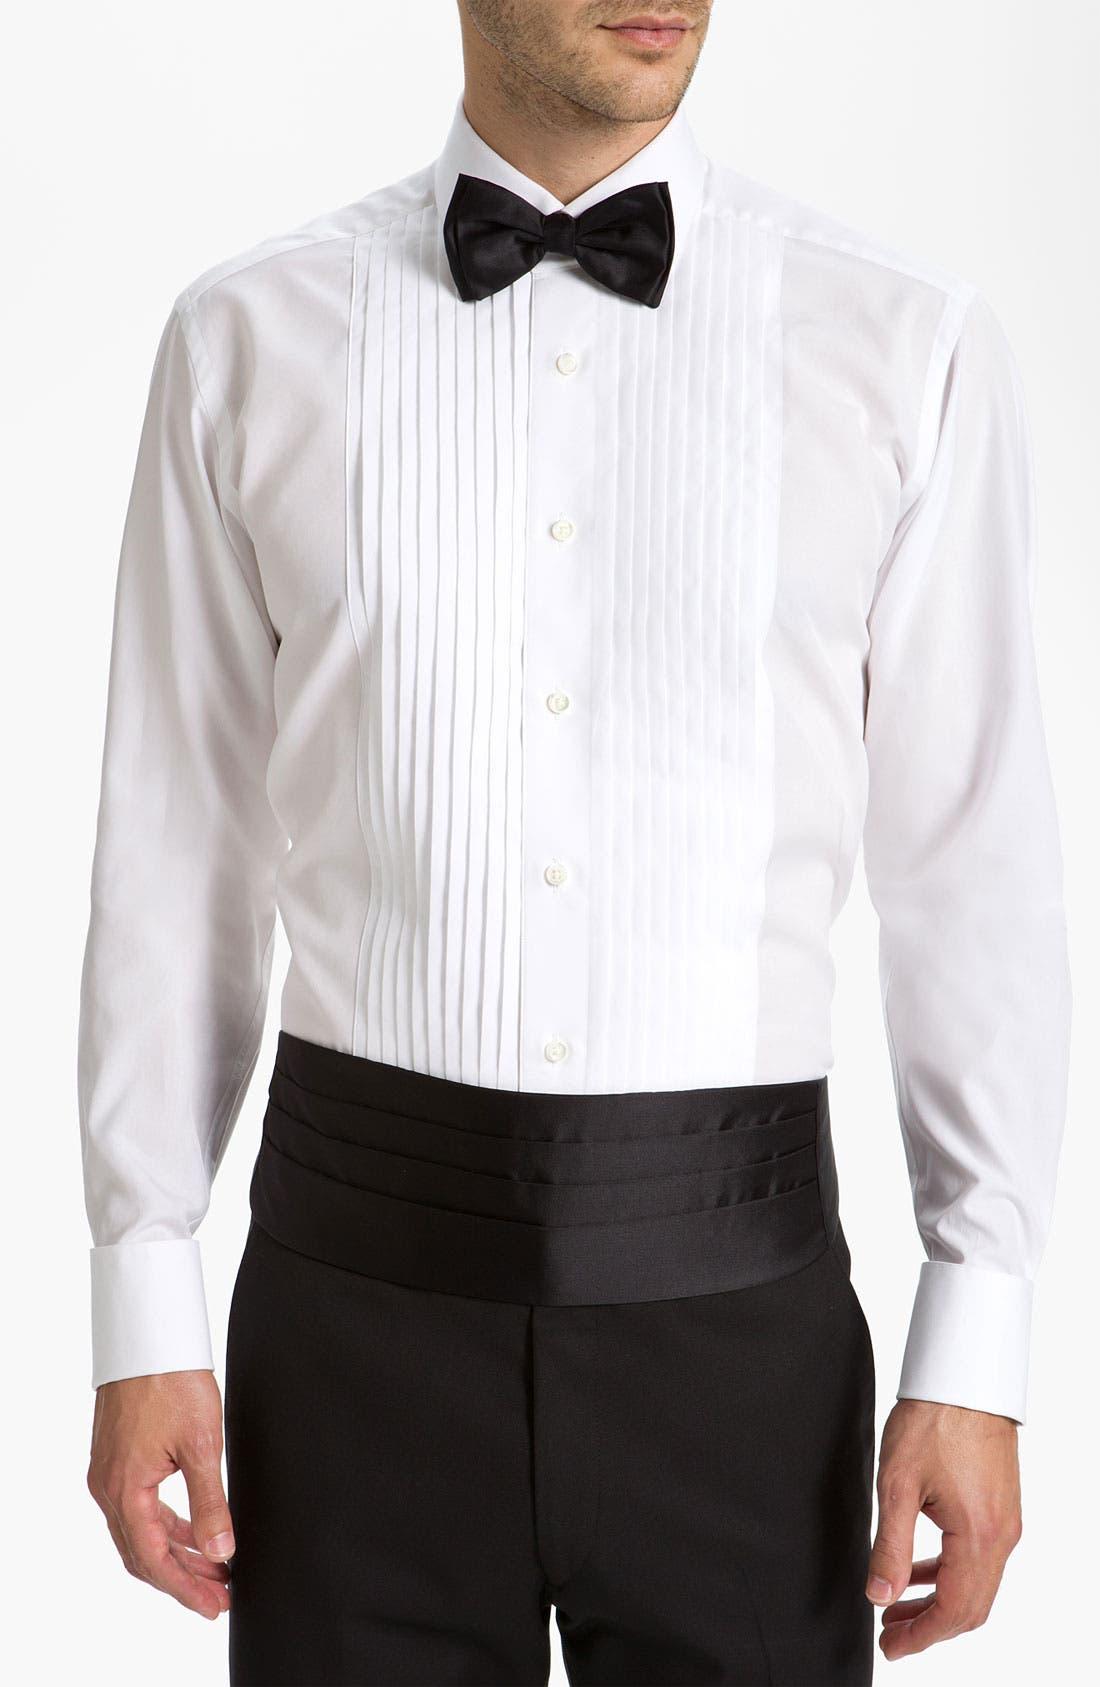 Main Image - BOSS Cummerbund & Bow Tie